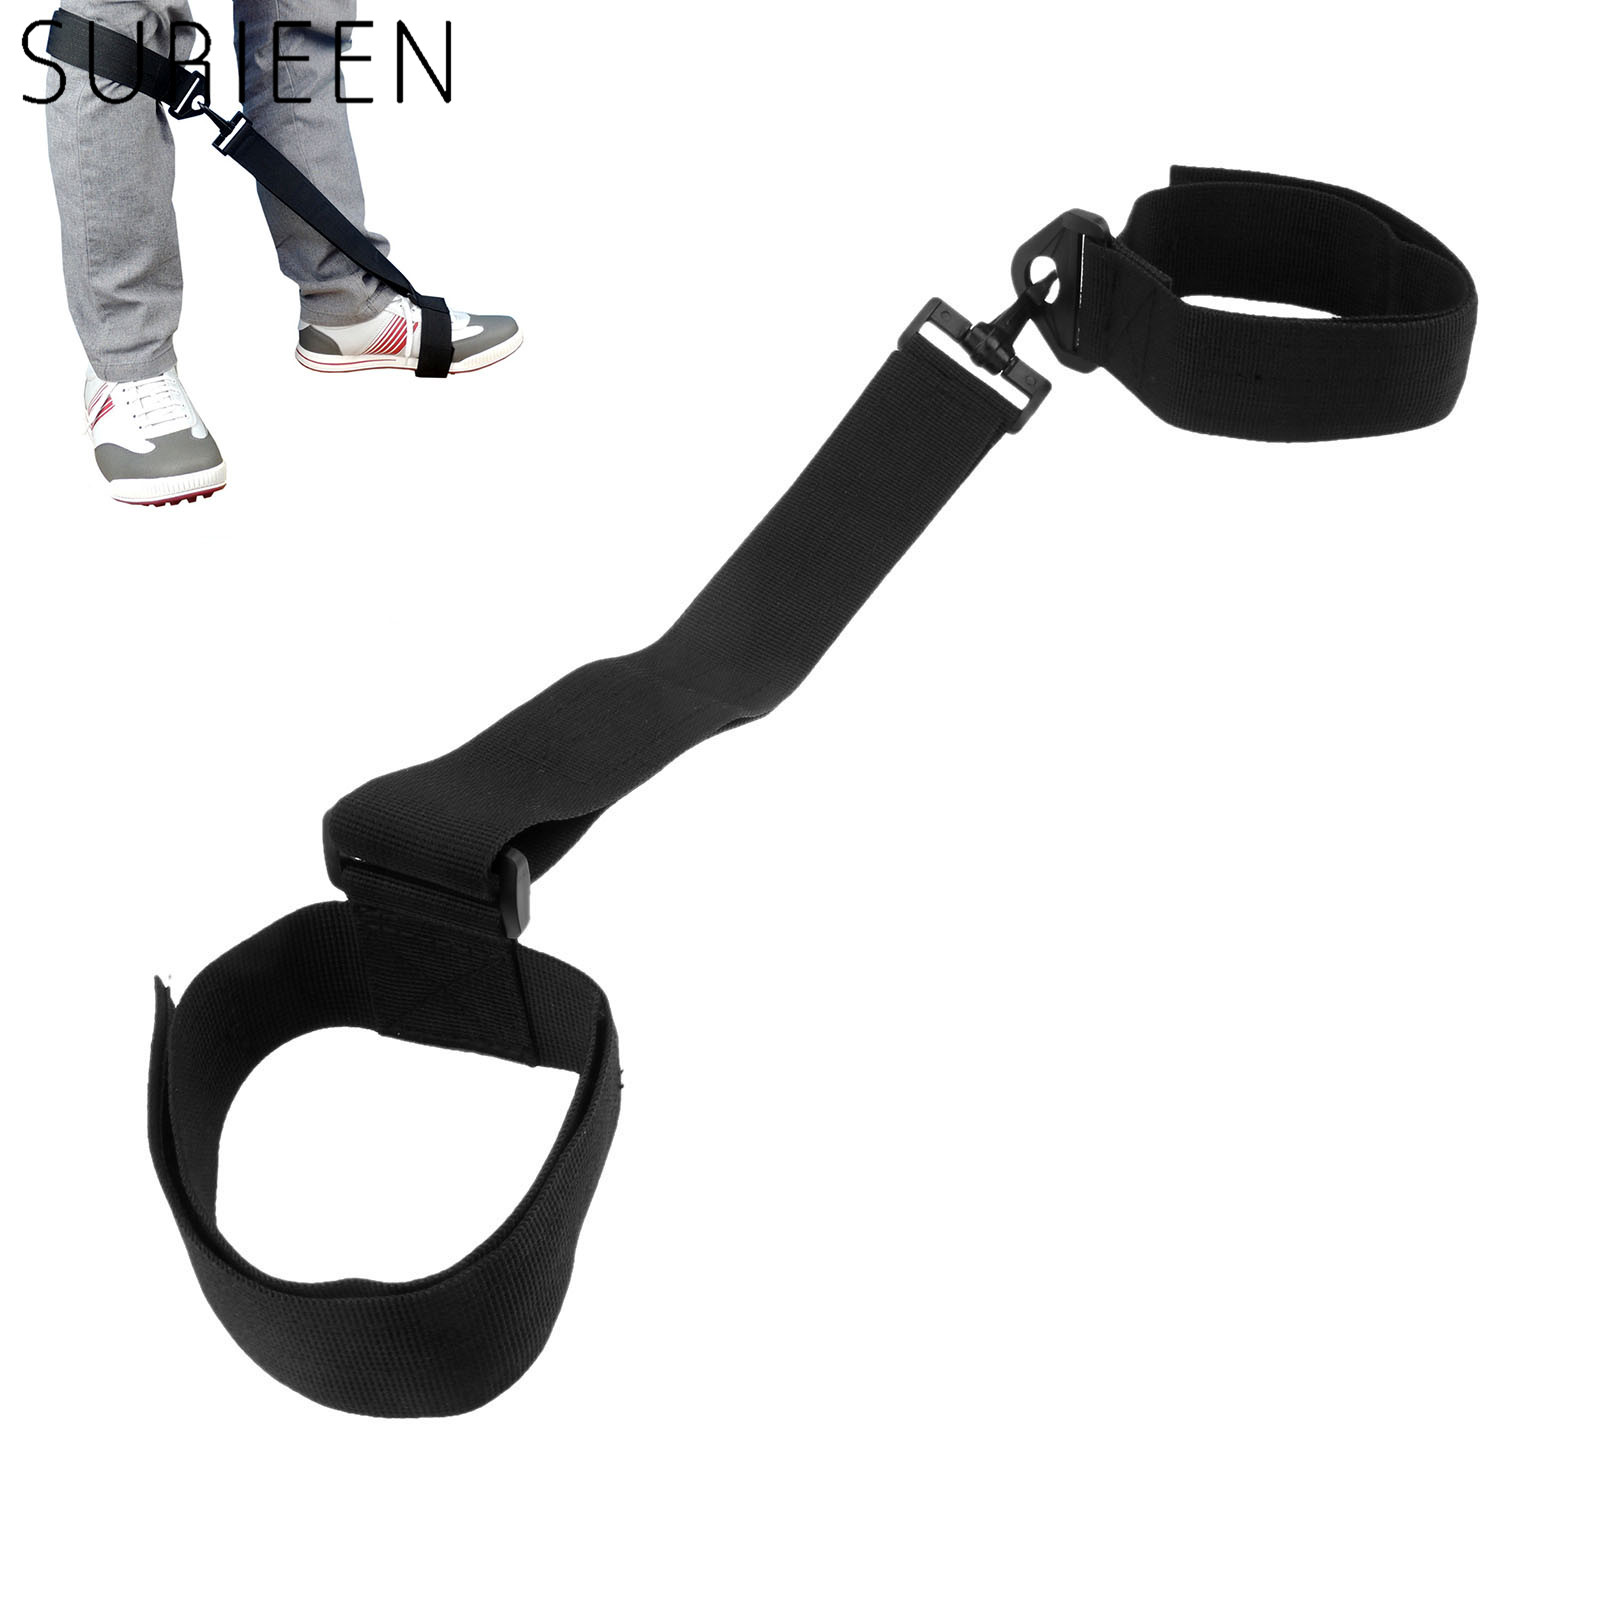 Golf Training Aids Golf Leg Strap For Golf Beginners, Golf Swing Practice Trainer, Leg Brace Band Strap Posture Corrector Belt